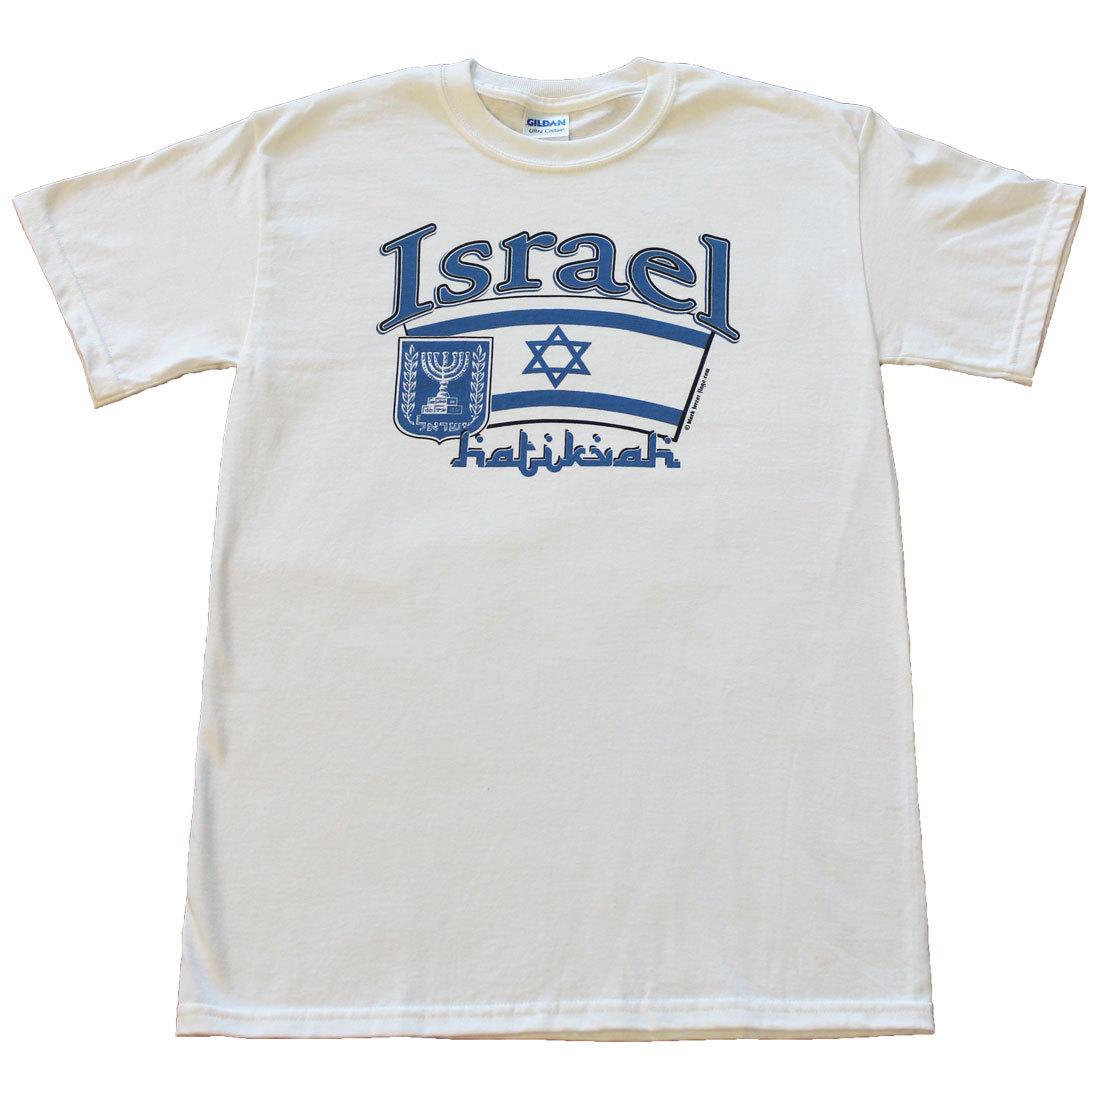 Israel2 1